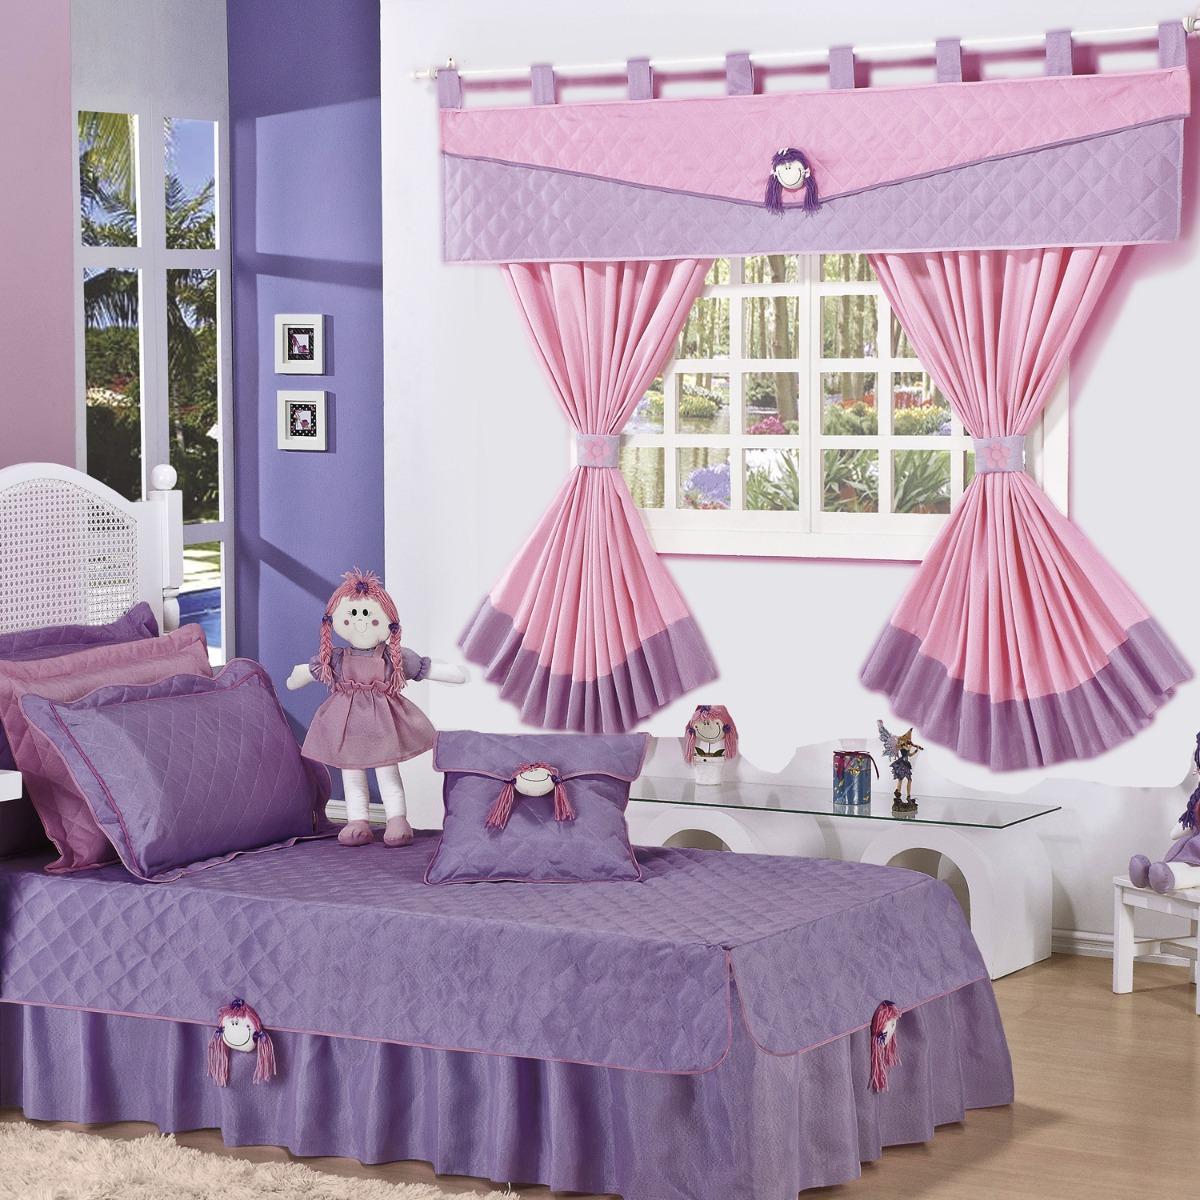 2fbf4d91cf kit cobre leito solteiro infantil menino ou menina + cortina. Carregando  zoom.